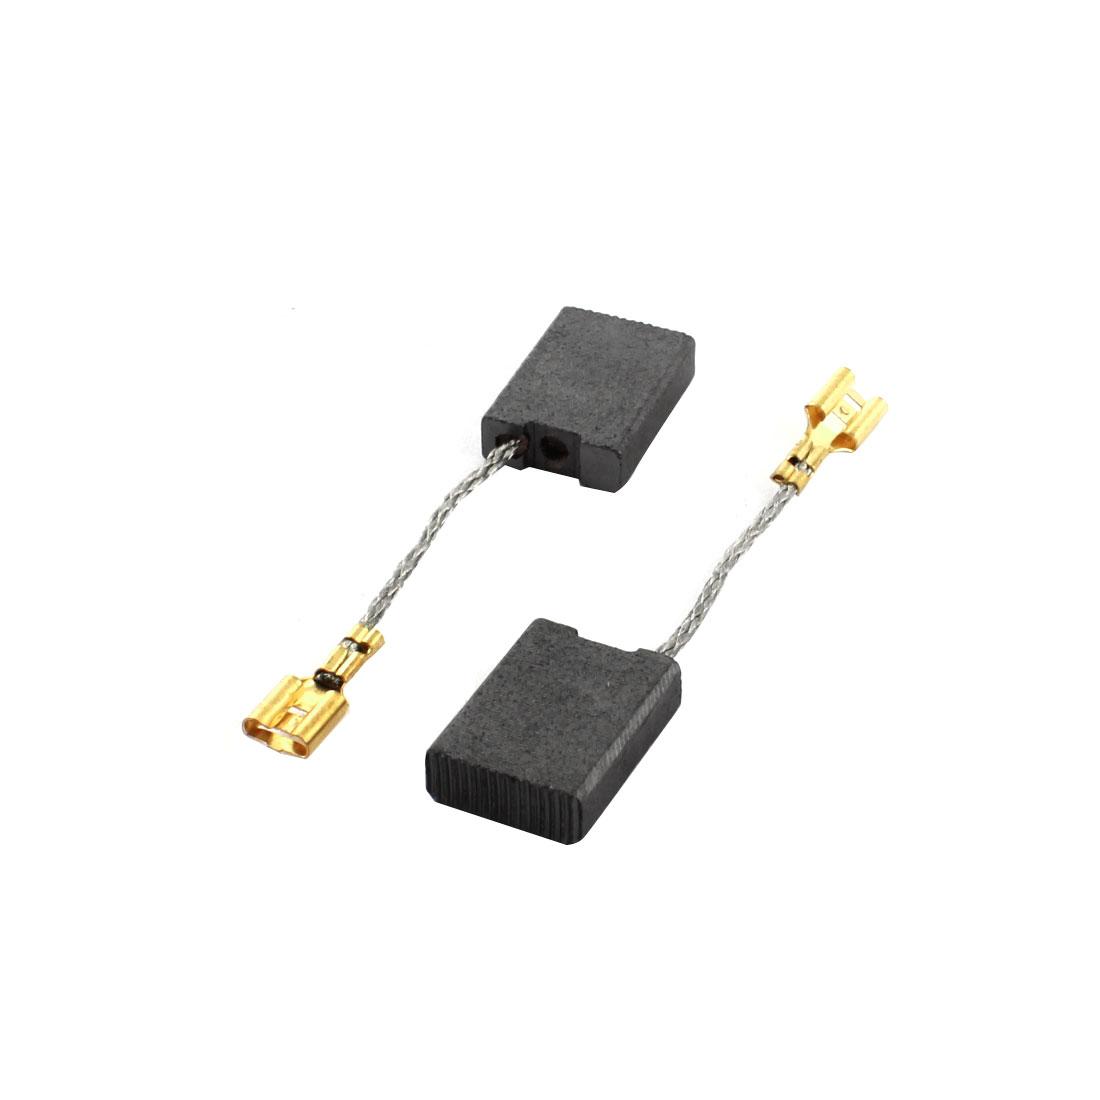 2 Pcs 15 x 5 x 22mm Carbon Brush for Bosch GBH11E Demolition Hammer